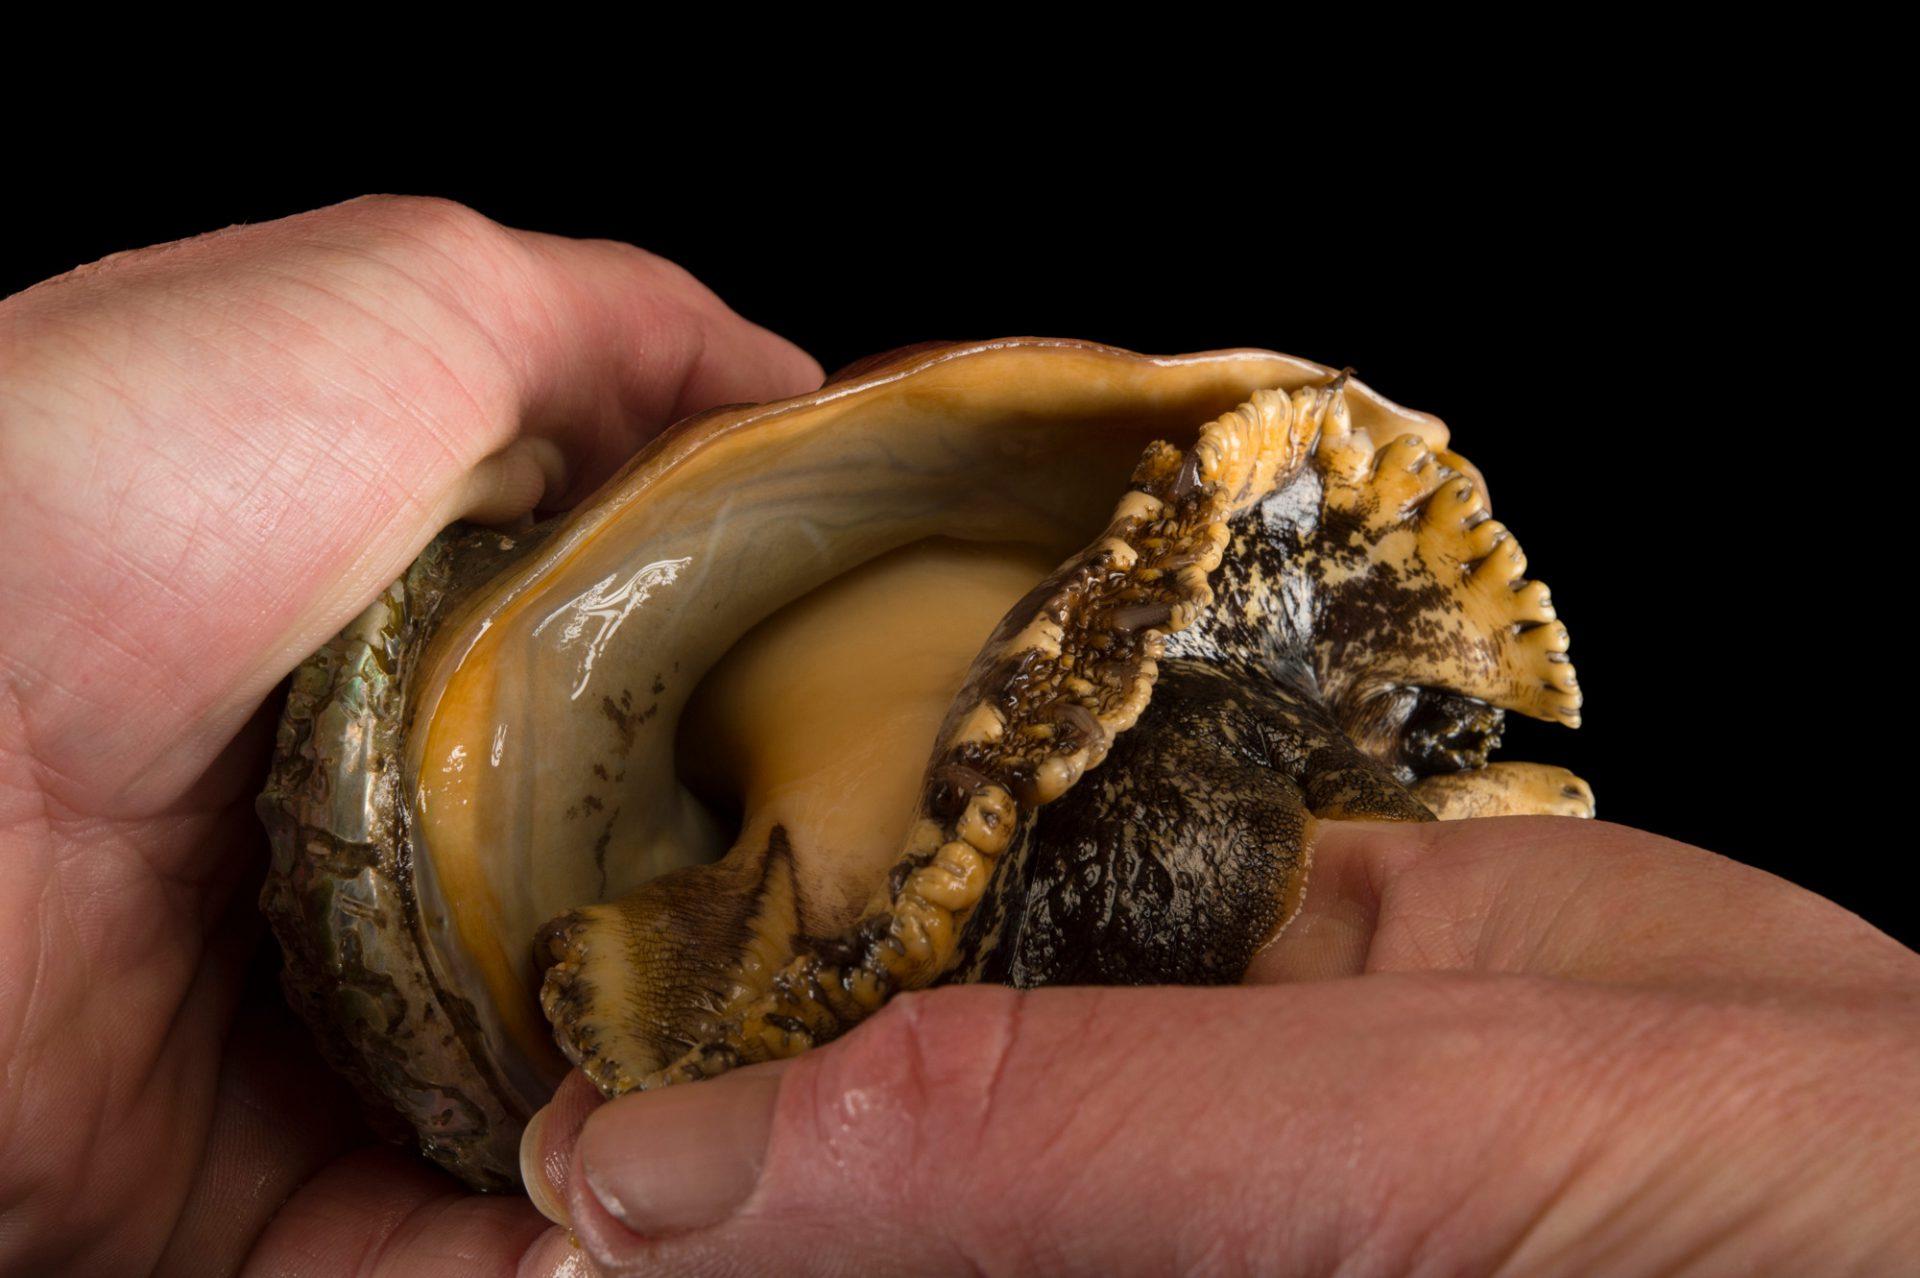 Photo: Pinto abalone (Haliotis kamtschatkana) coming out of shell at Alutiiq Pride Shellfish Hatchery in Seward, AK.